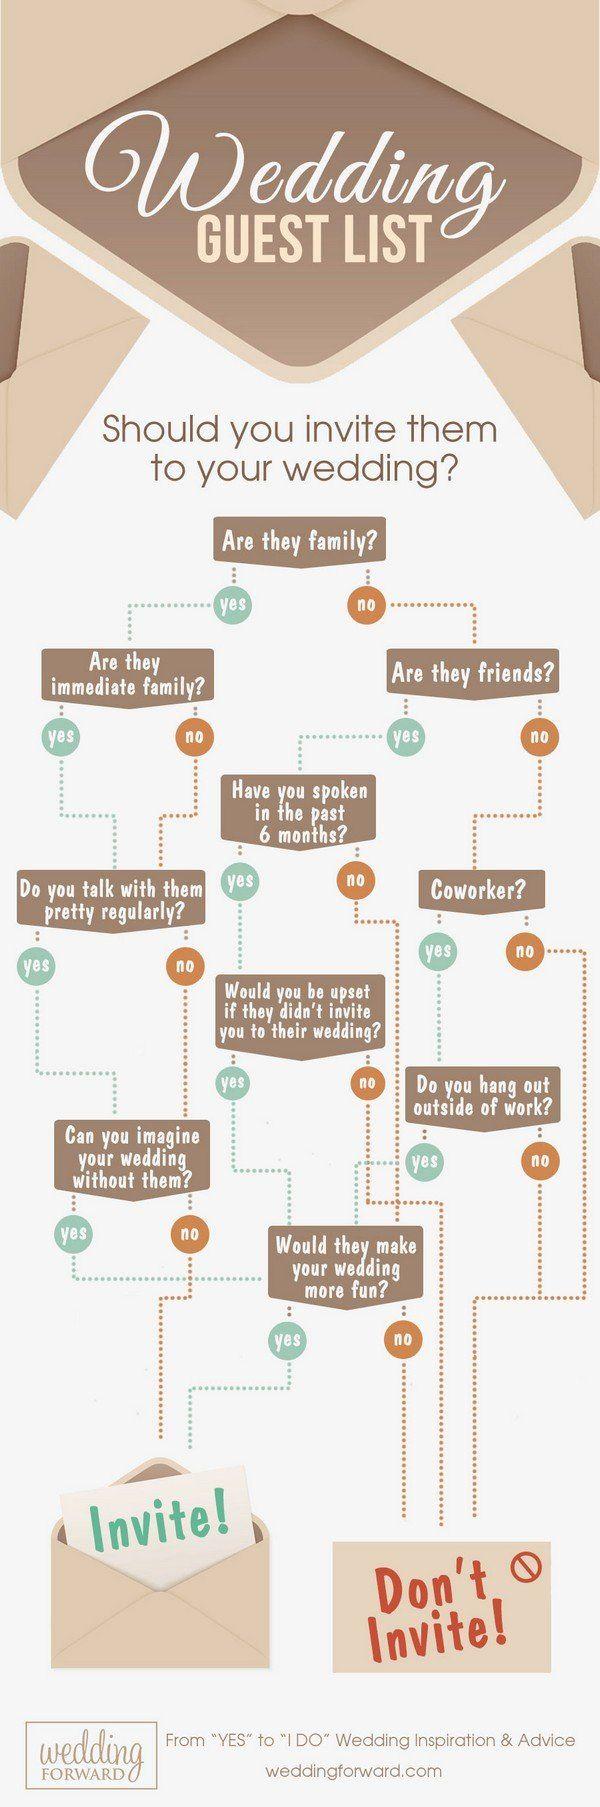 useful wedding guest list guide